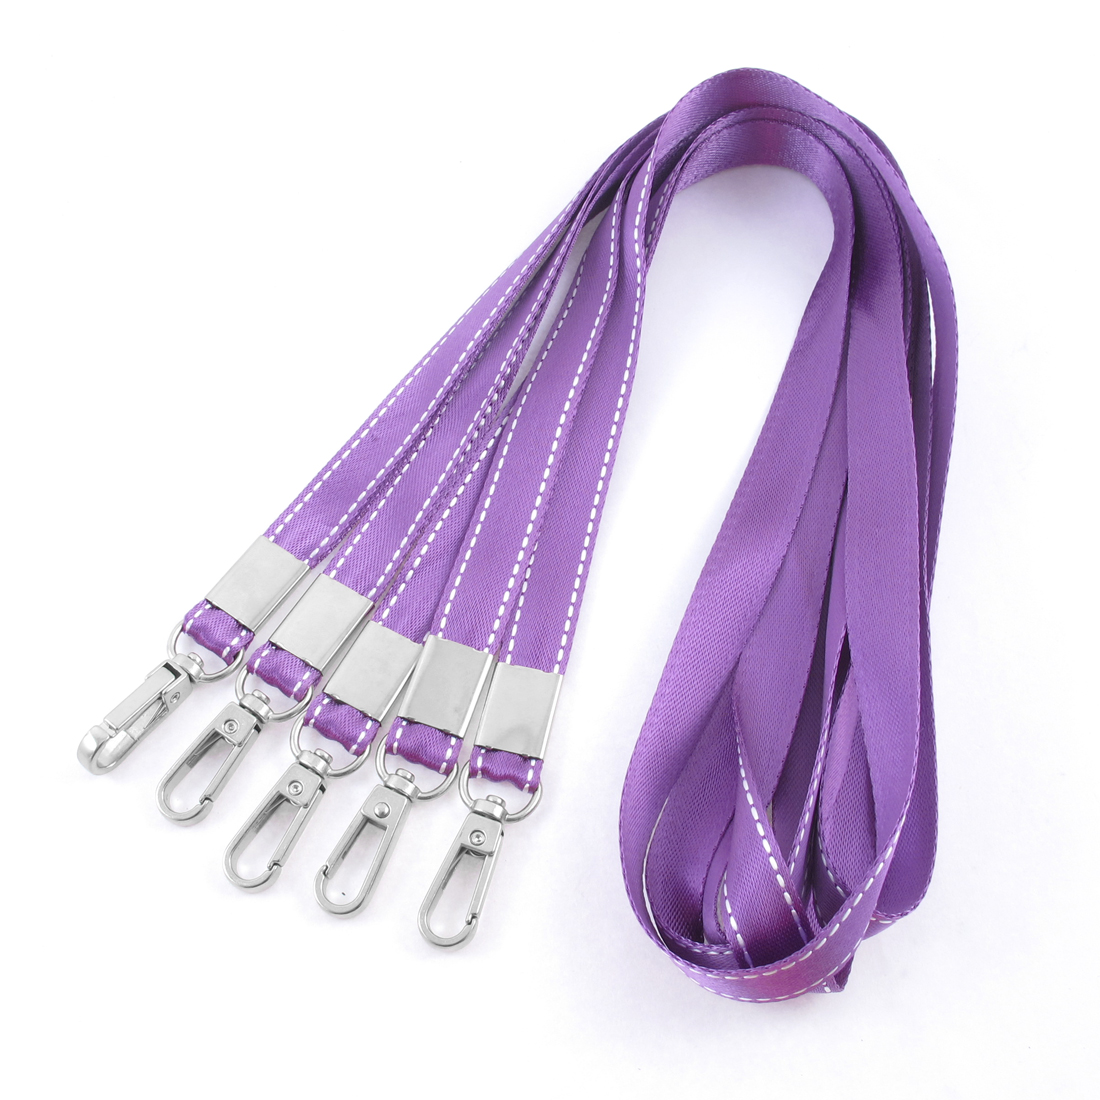 Work Cards USB Keys Phone Holder Keychain Cord Lanyard Neck Strap Purple 5pcs